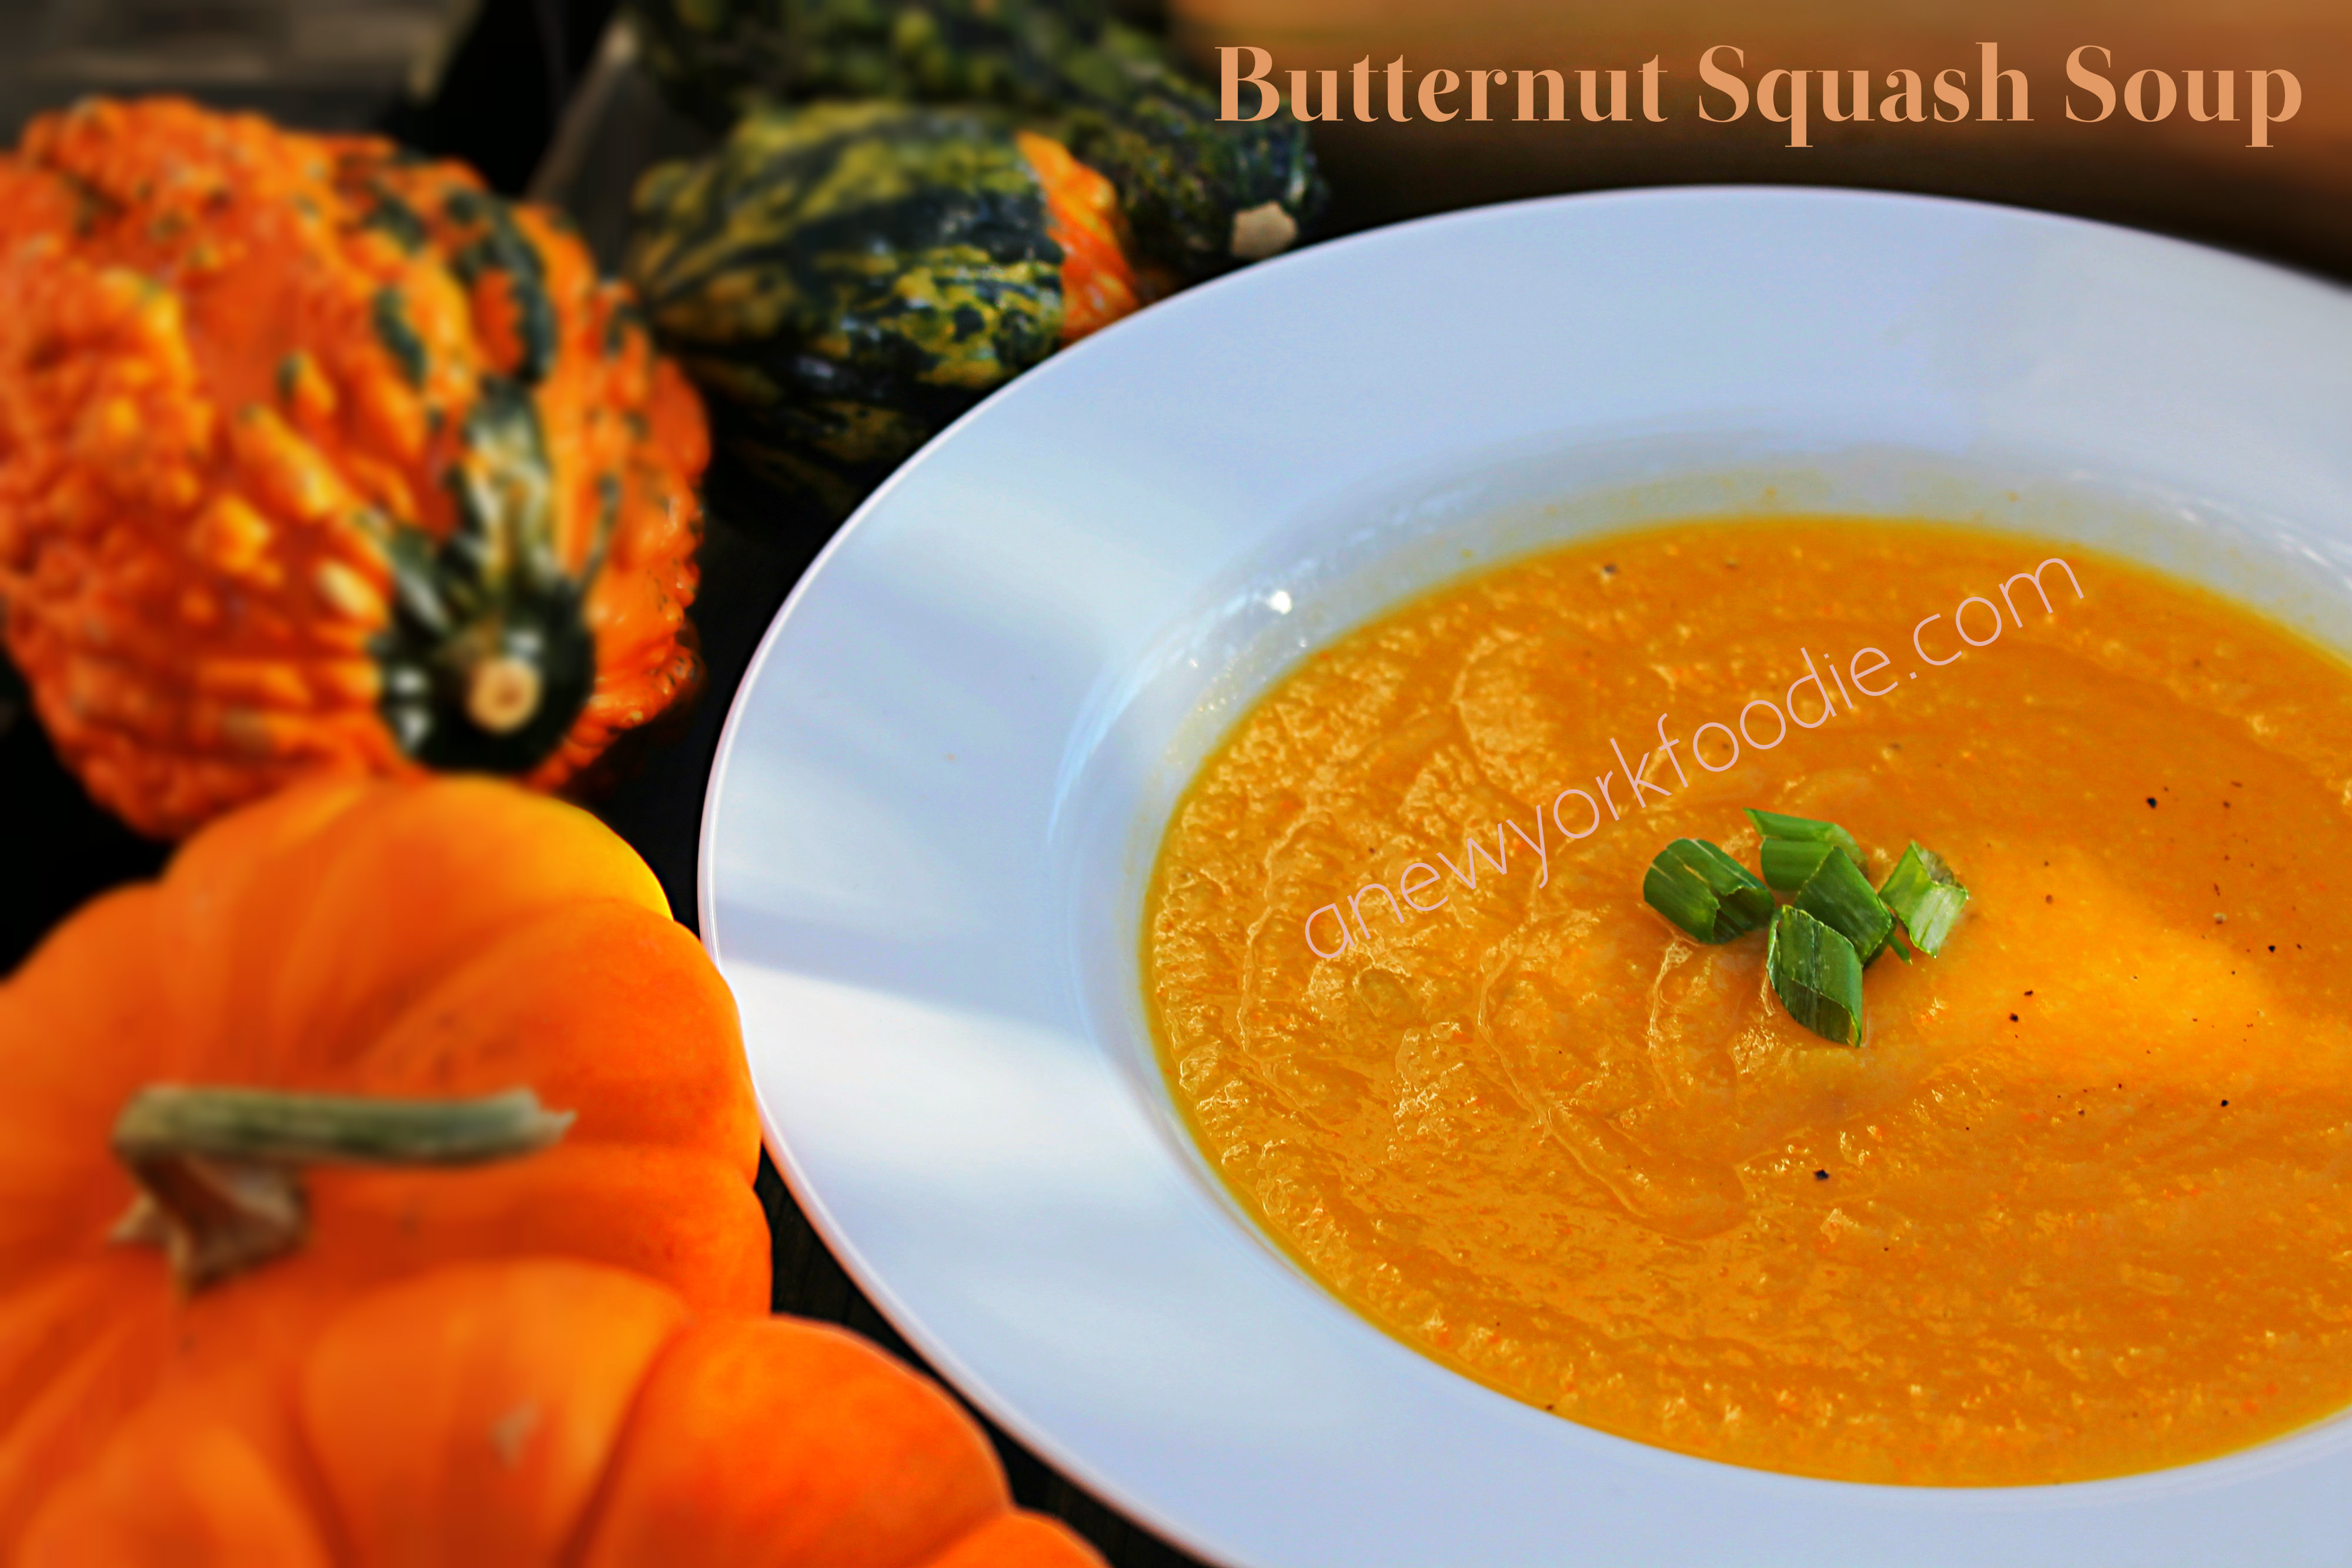 Butternut Squash Soup, Squash Soup, Butternut Squash